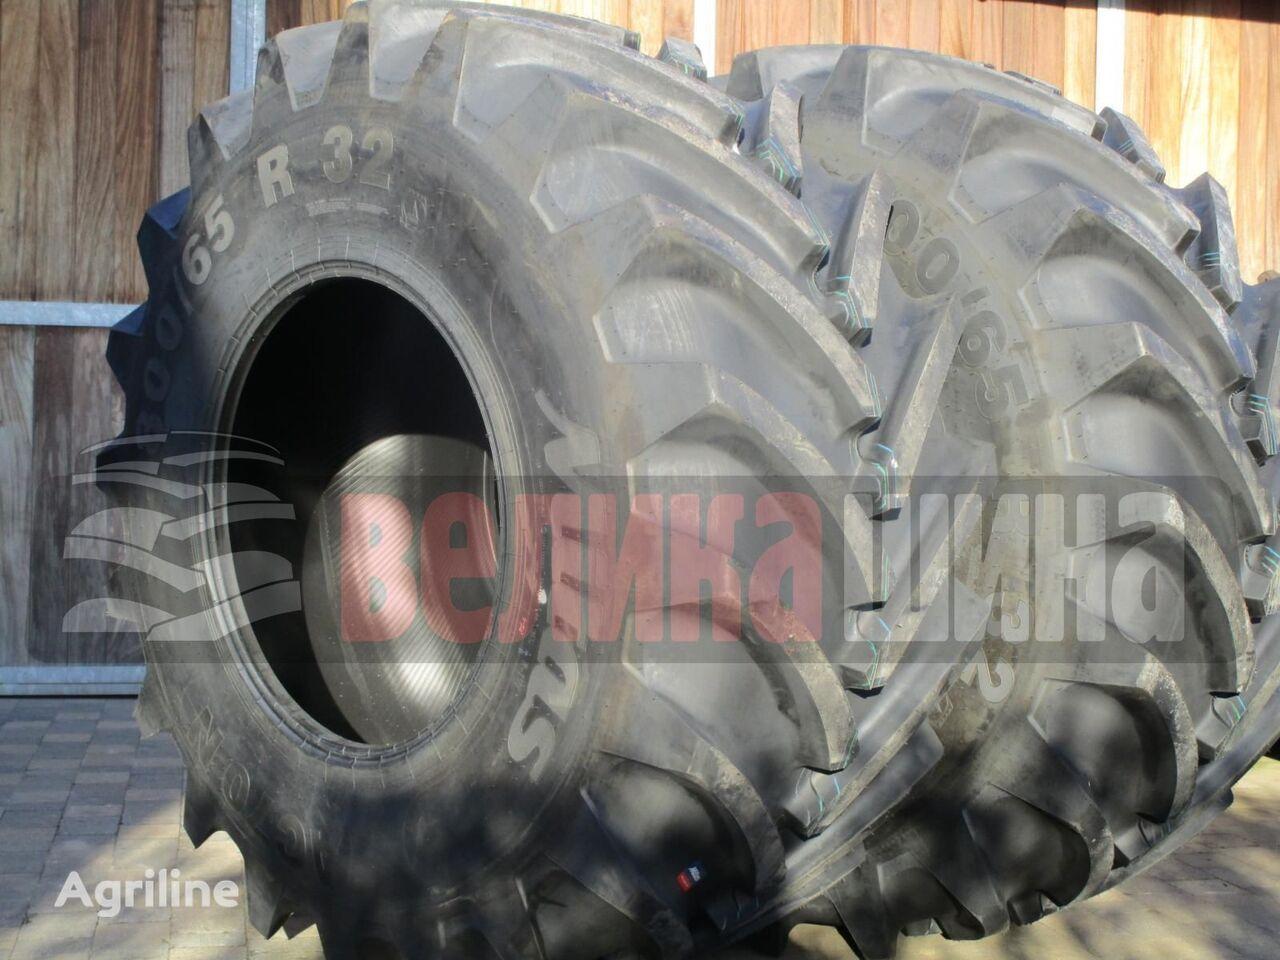 new Mitas 800/65R32 (30.5LR32) combine tire